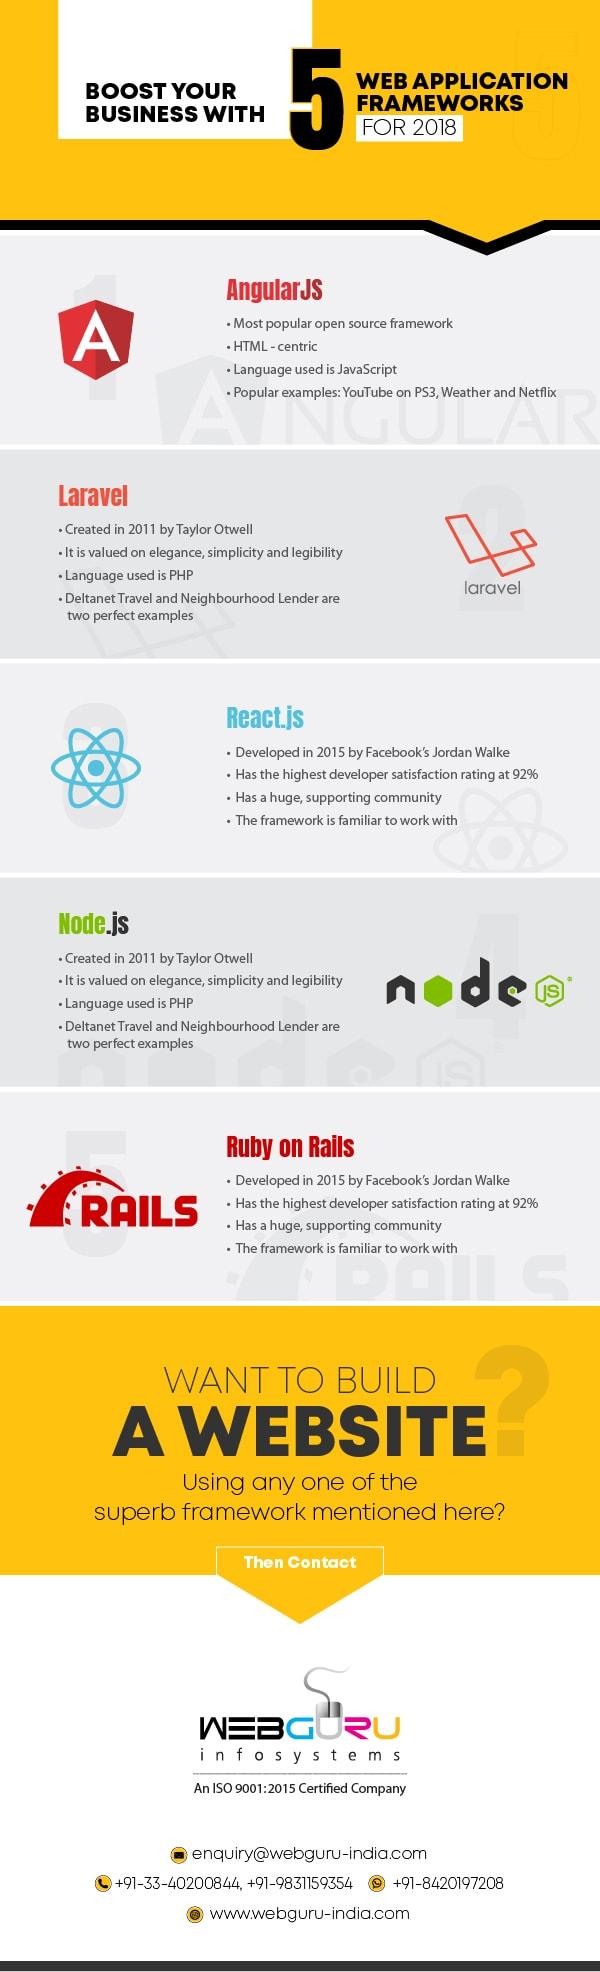 Web Application Framework 2018 Infographic